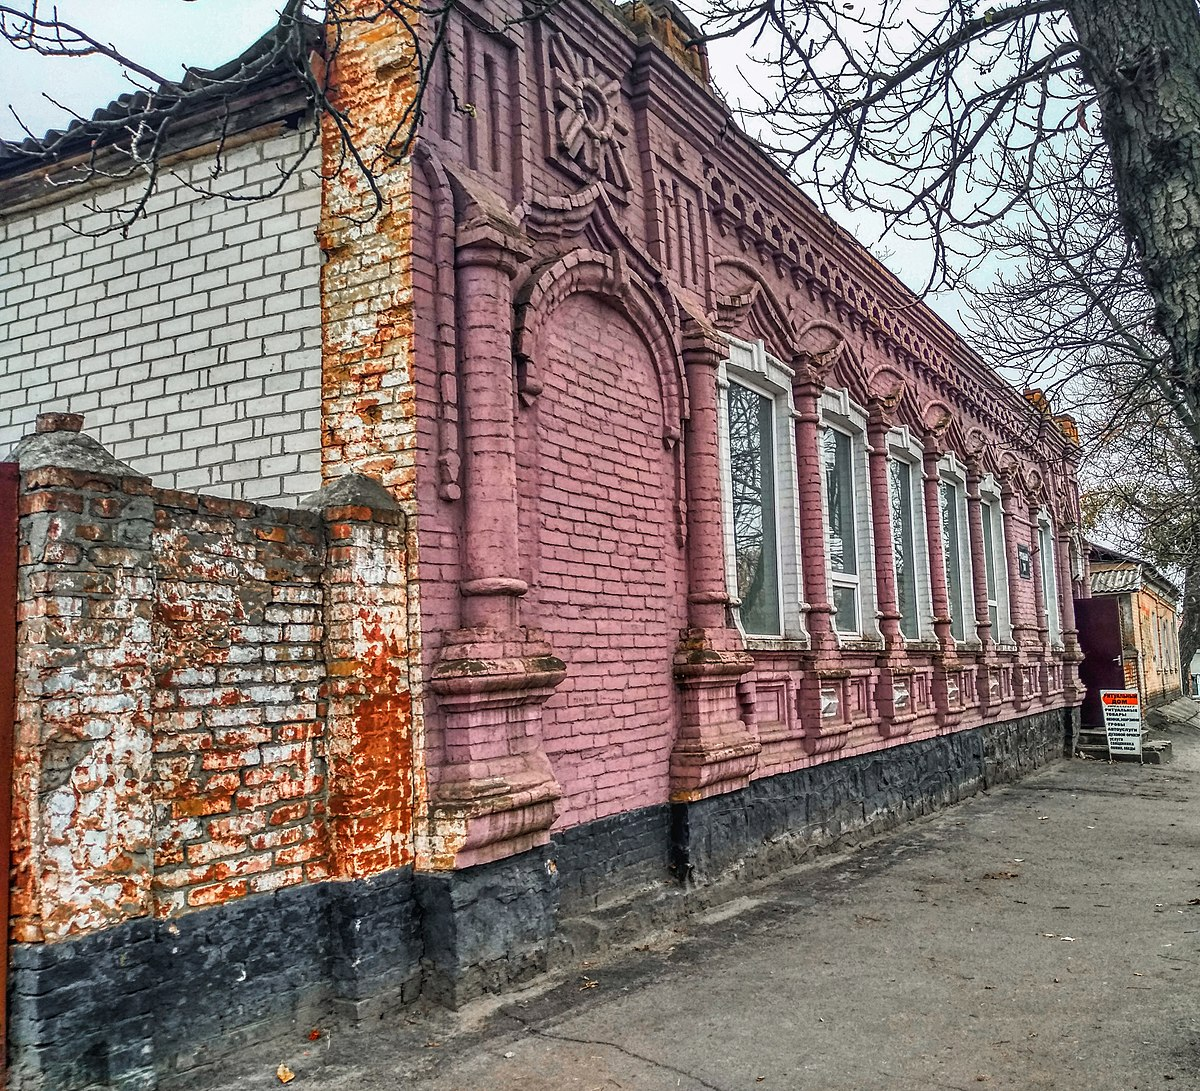 File:Житловий будинок, вул. Зої Космодемянської 10.JPG - Wikimedia Commons